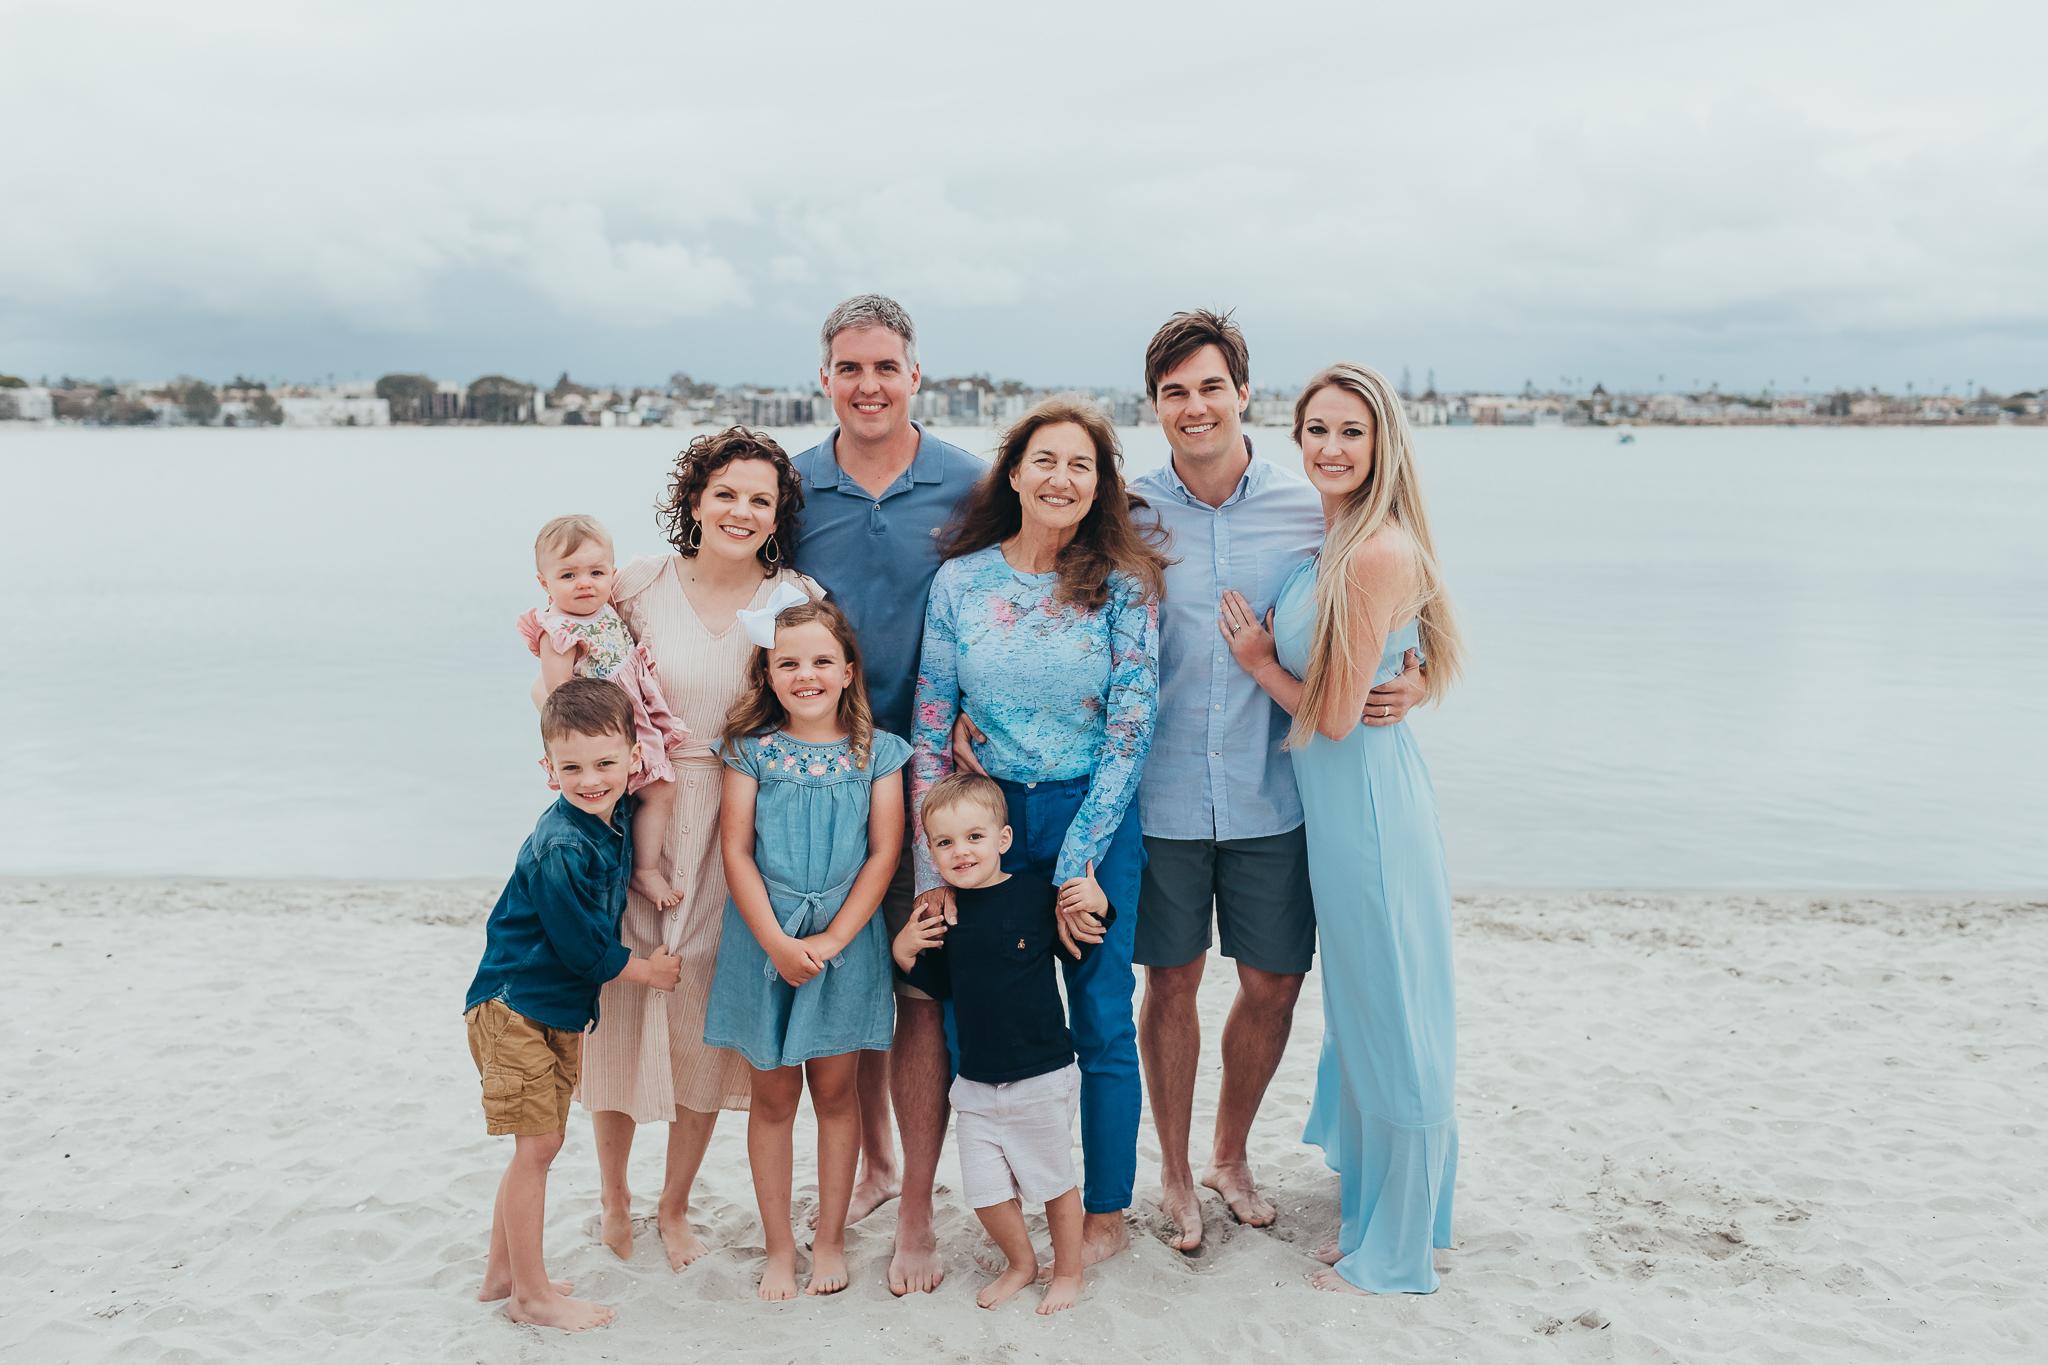 Mission Beach Vacation Family Photos San Diego Christine Dammann-2.jpg